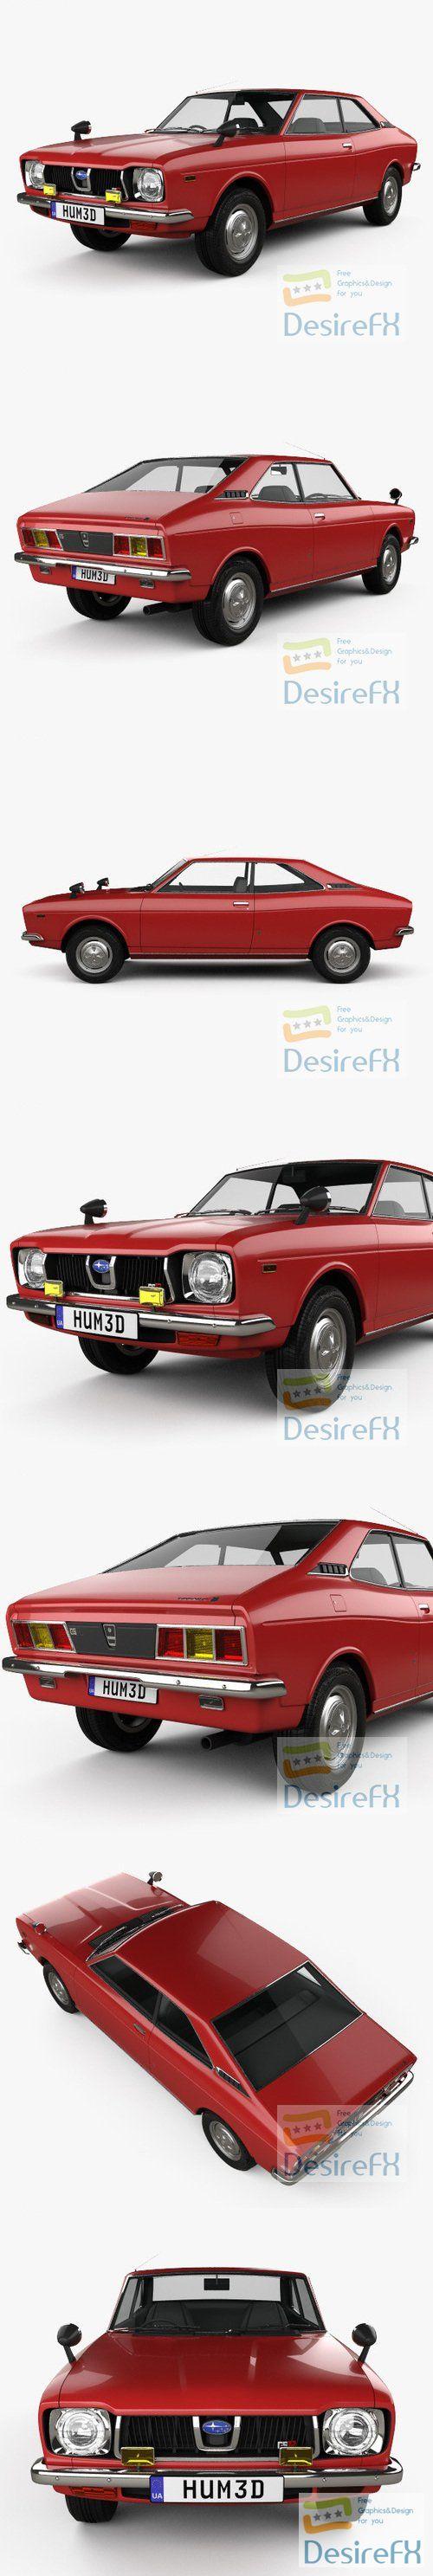 Subaru Leone GSR 1972 3D Model